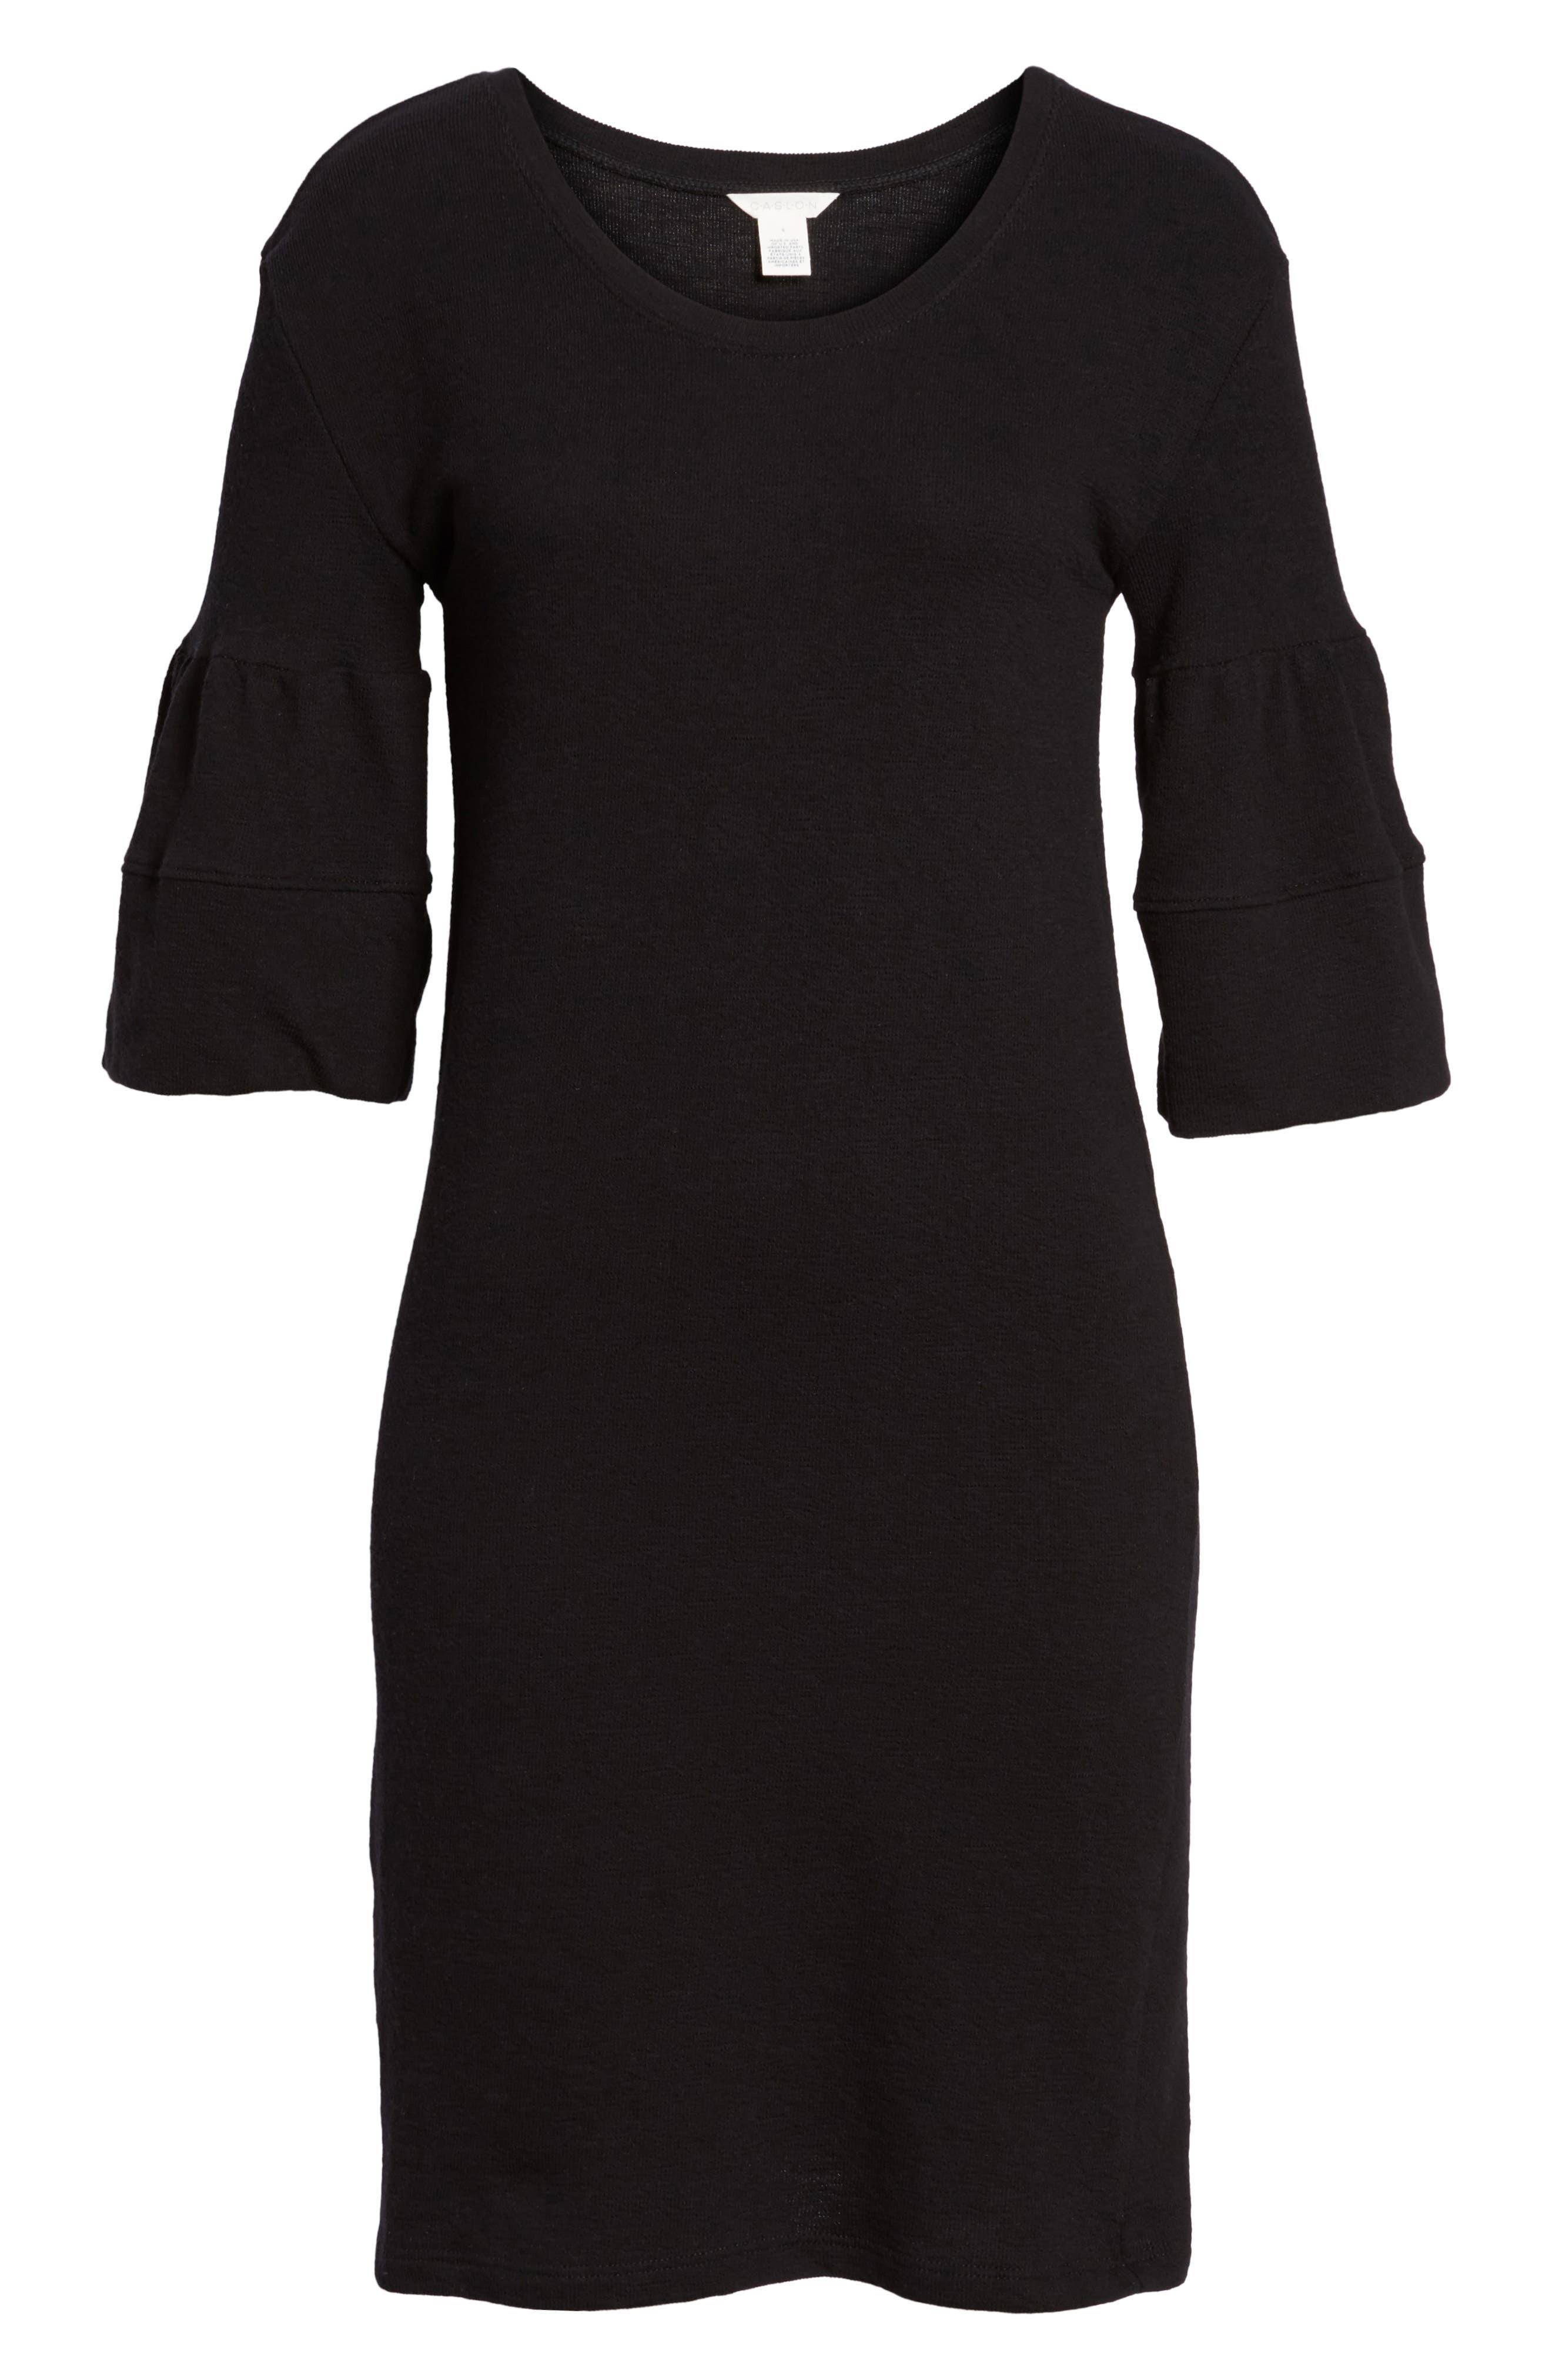 Ruffle Sleeve Knit Dress,                             Alternate thumbnail 17, color,